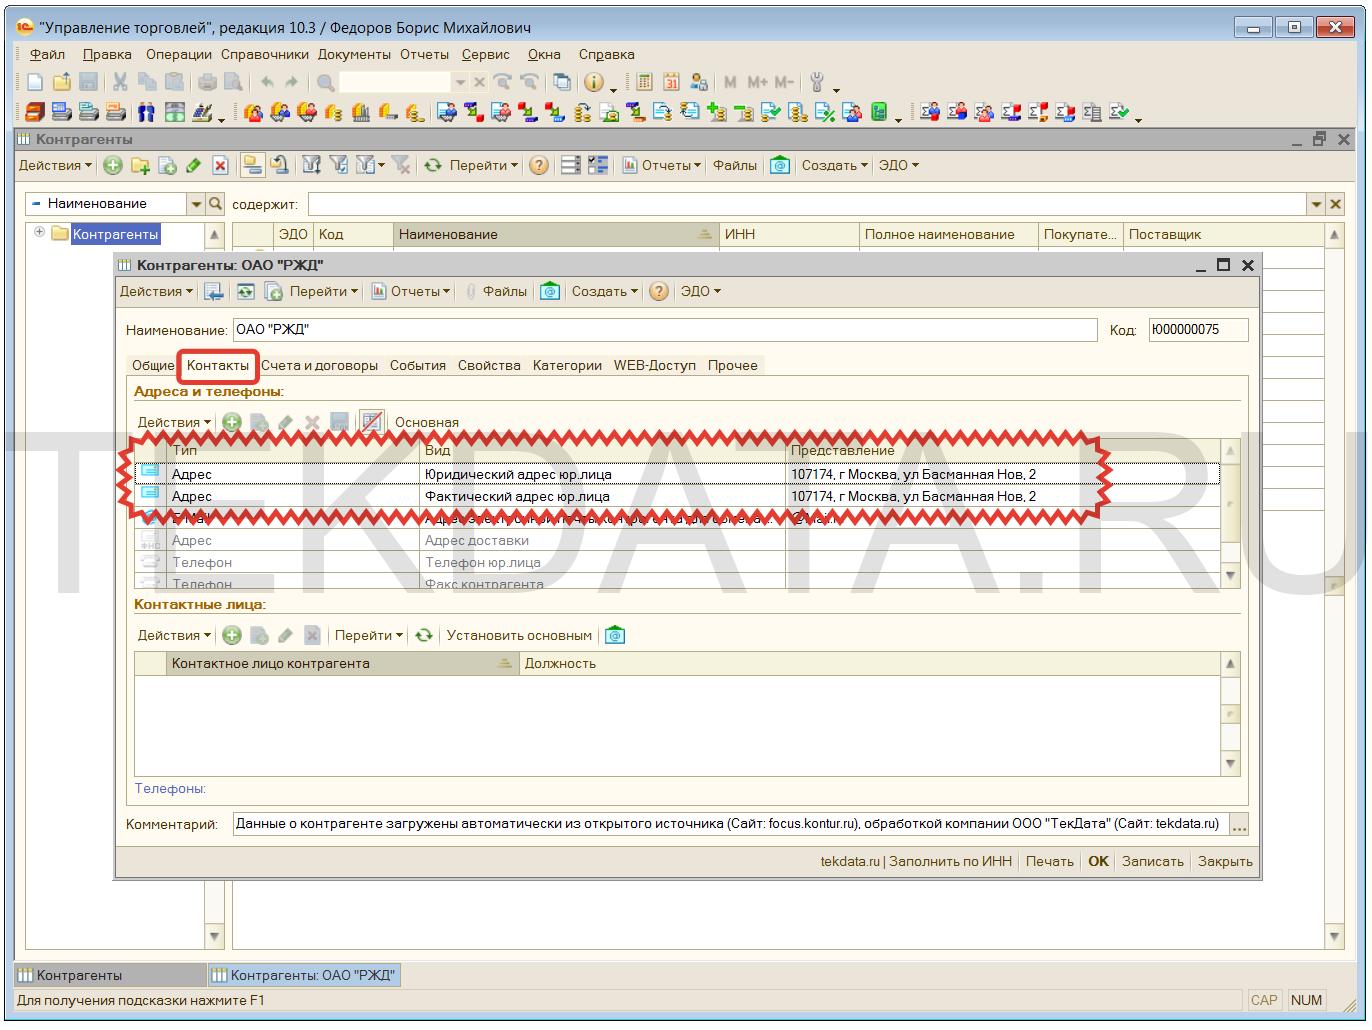 Заполнение контрагентов по ИНН в УТ 10.3 (Действия 7) | tekdata.ru